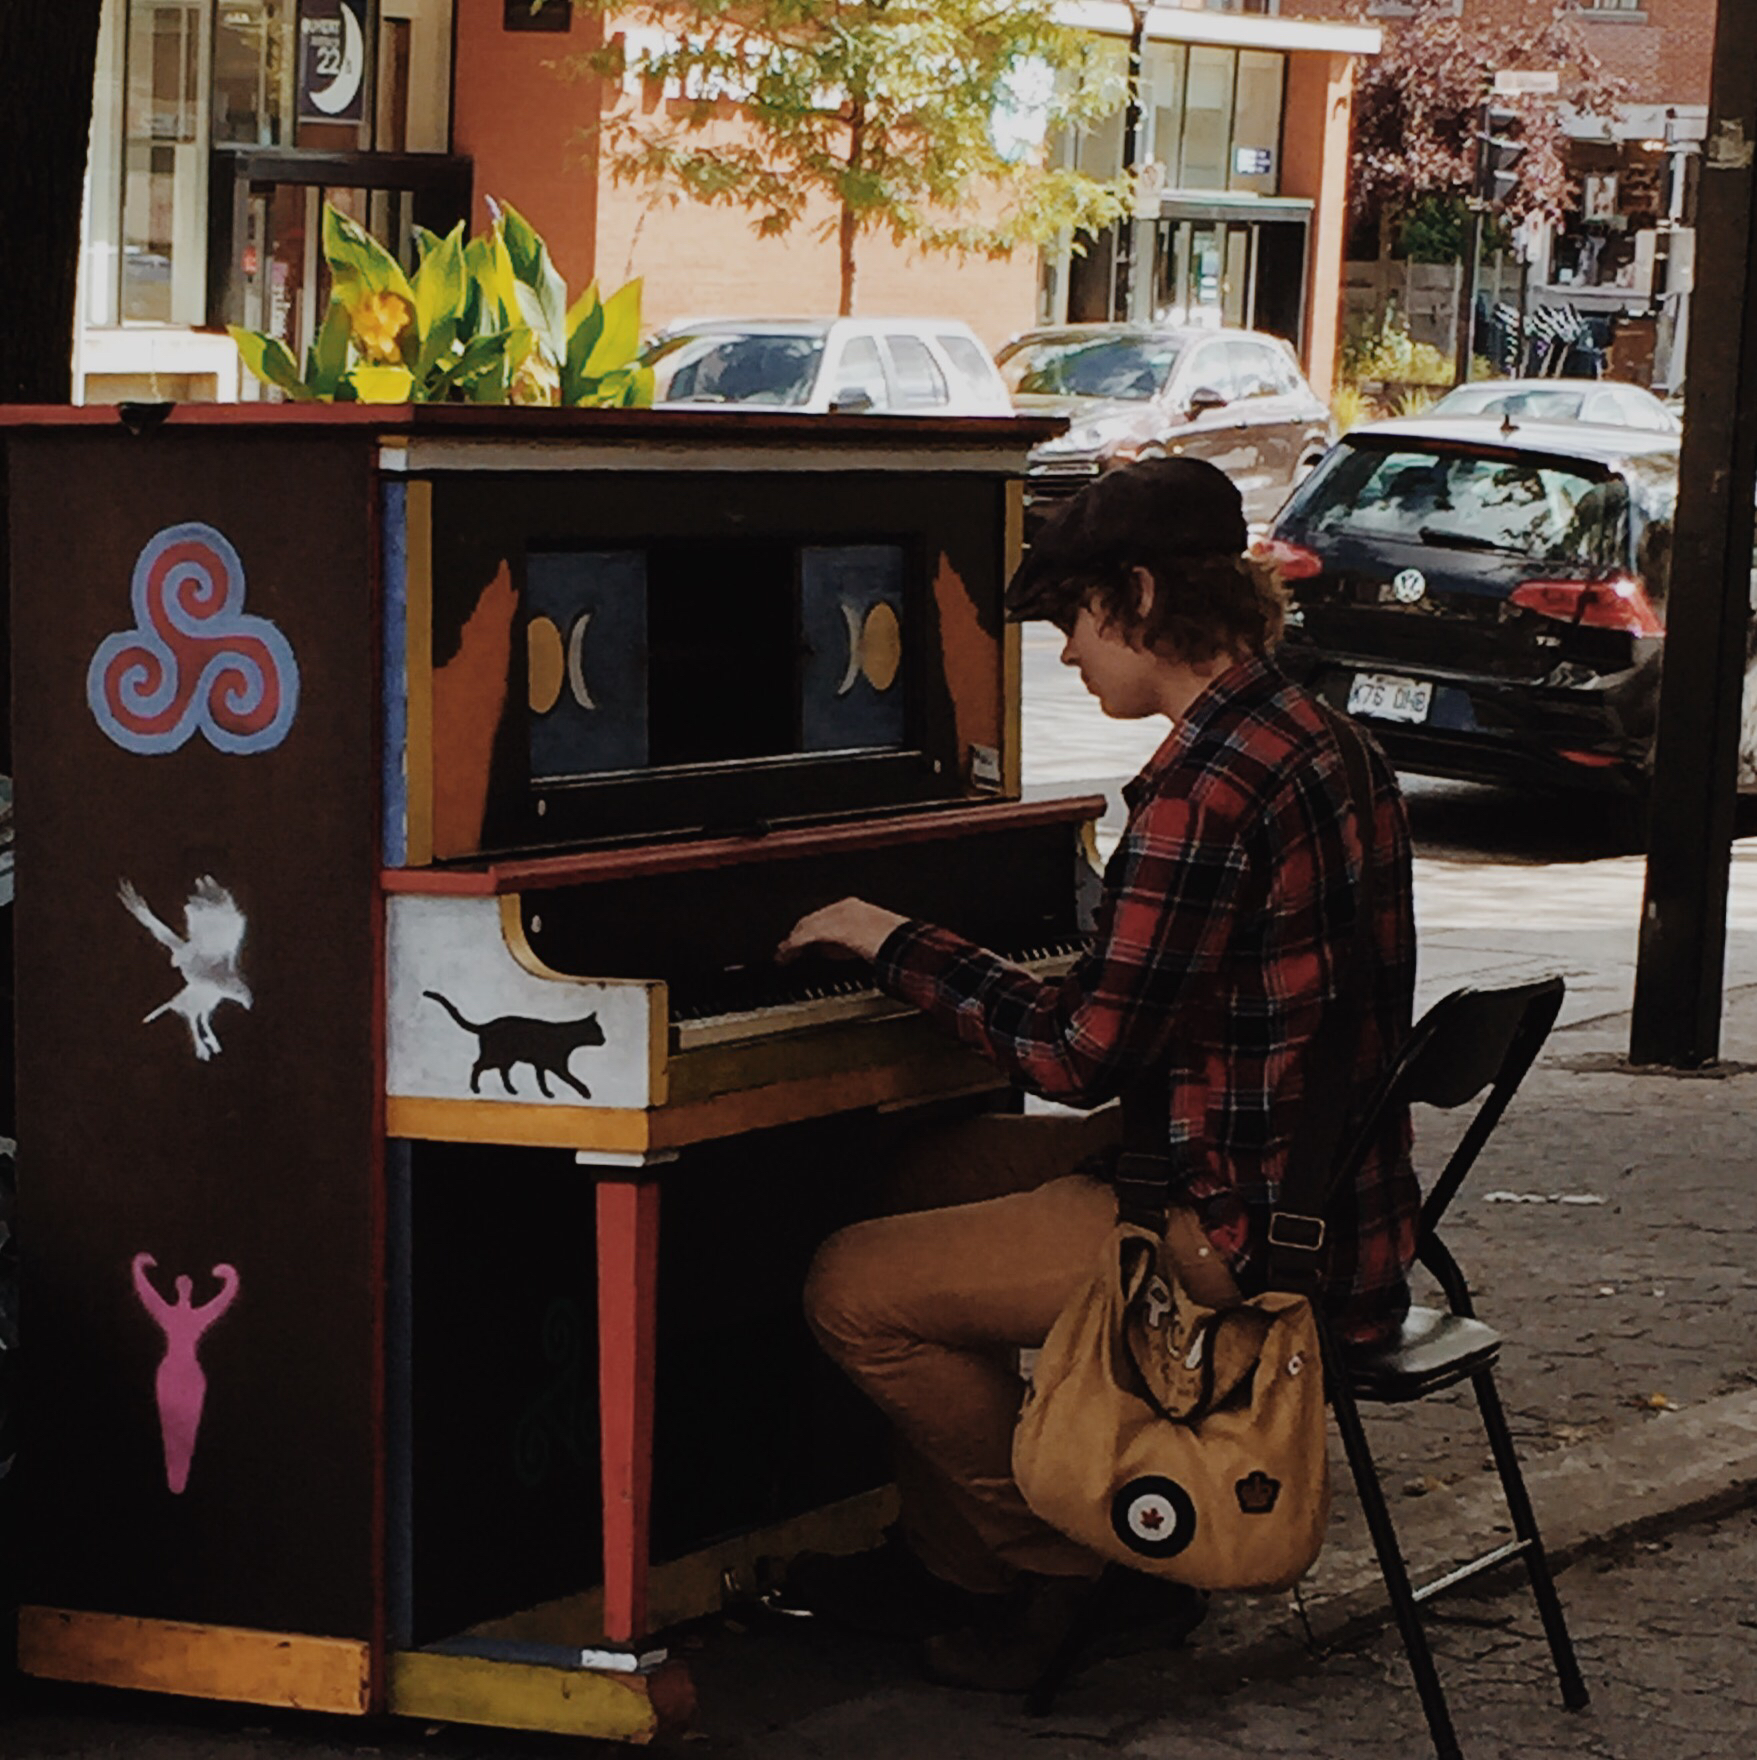 Public piano in Monkland Village via Lora Weaver Mysteries by Katy Leen